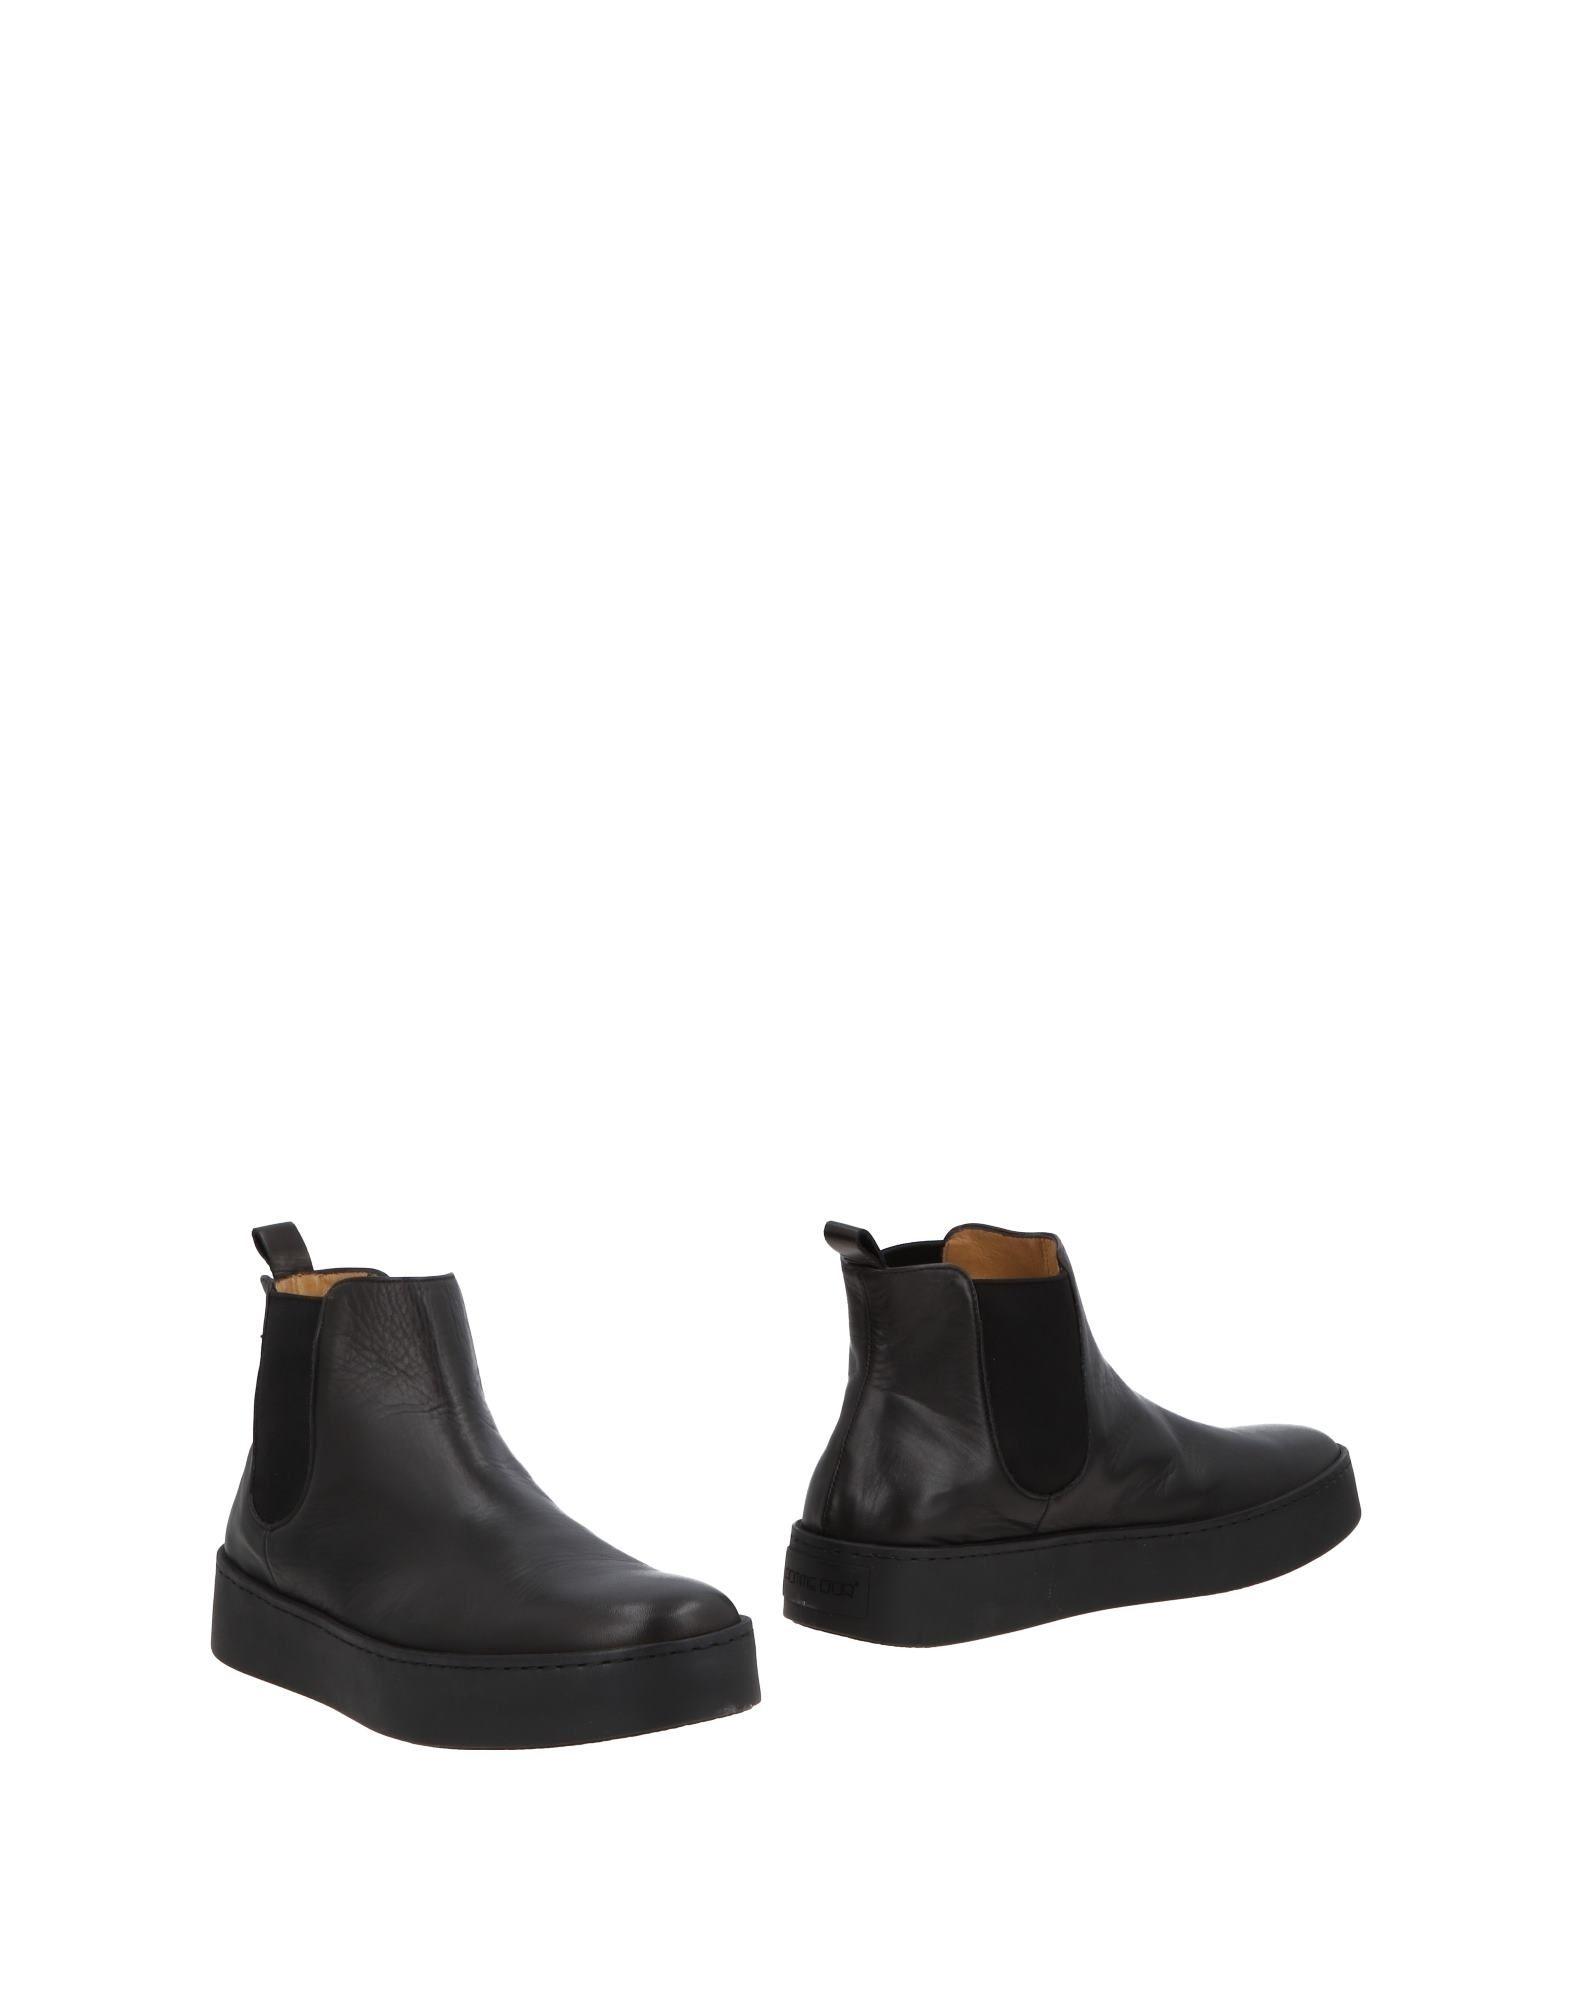 Stilvolle billige Schuhe Pomme D'or 11497466PV Chelsea Stiefel Damen  11497466PV D'or 29ae9c